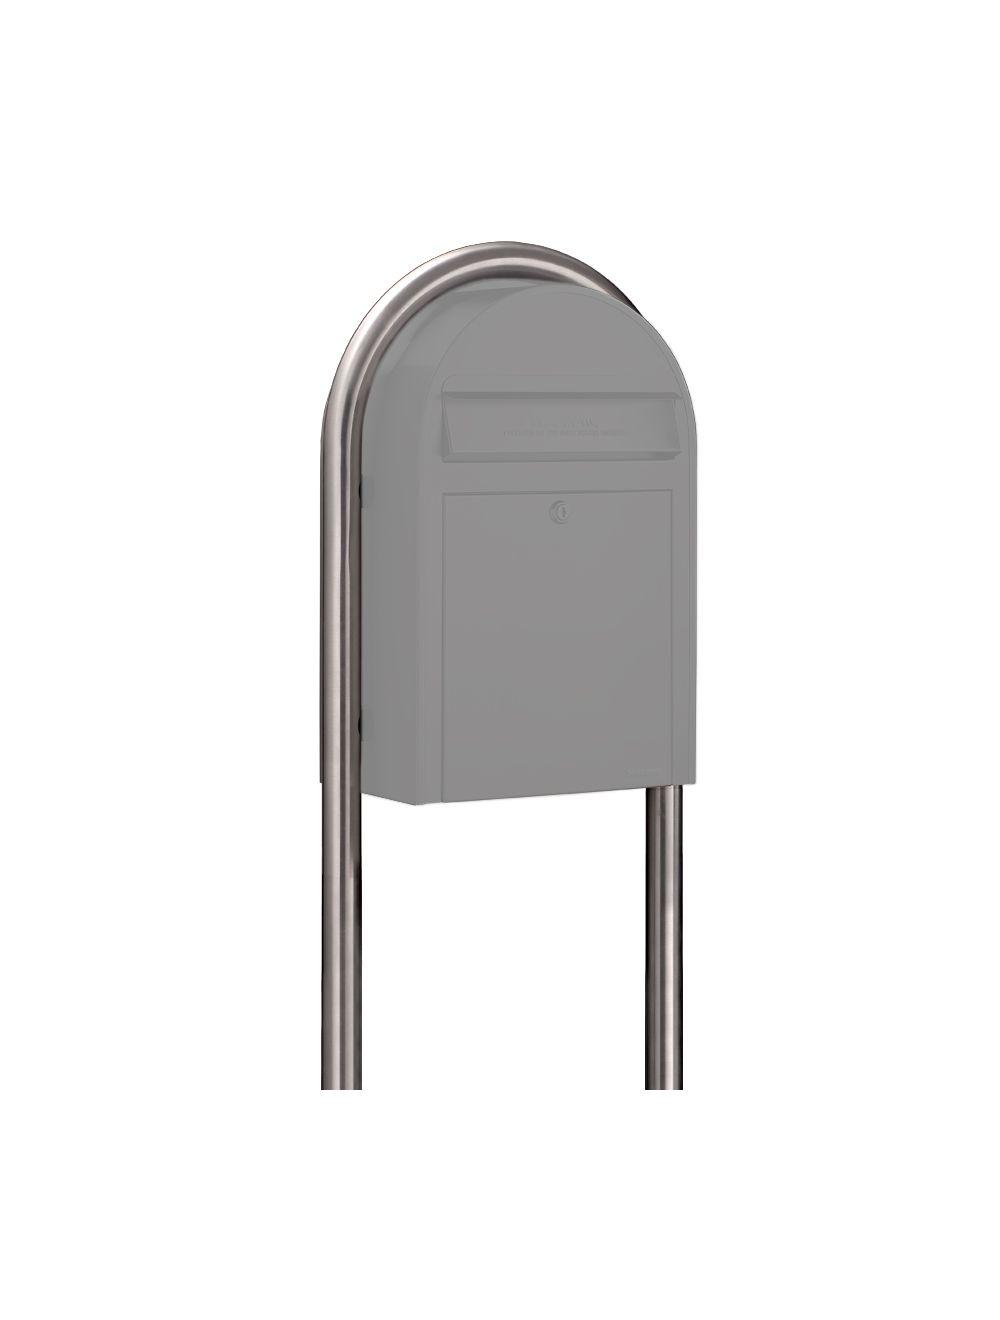 USPS Bobi Stainless Steel Round Mailbox Post